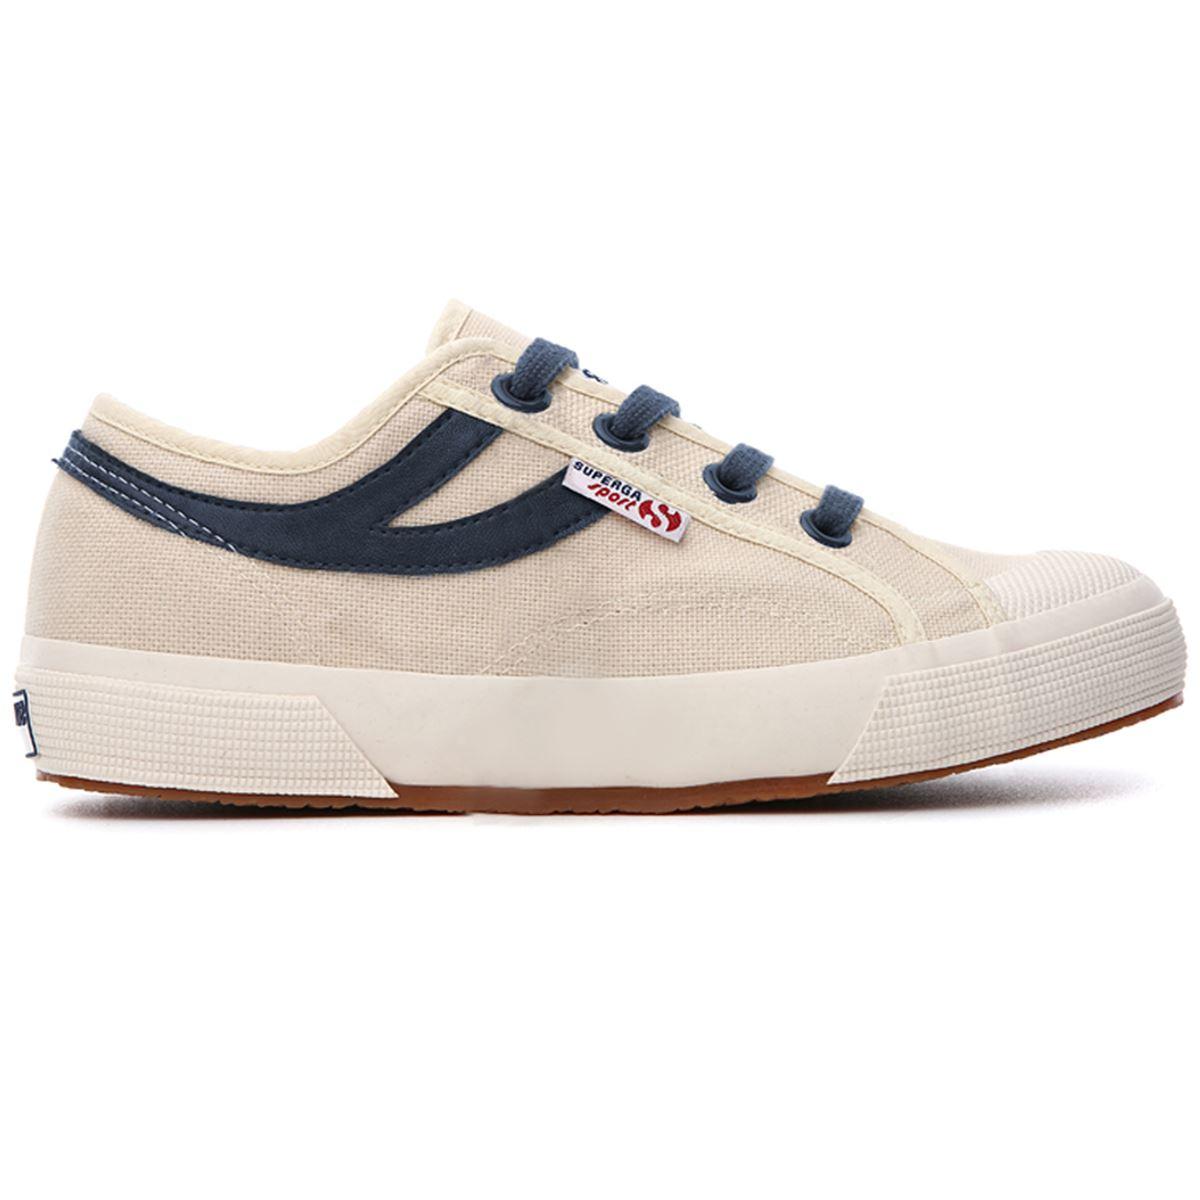 Superga Scarpe ginnastica 2750-JCOT PANATTA Bambino/a Tennis sport PNA Sneaker